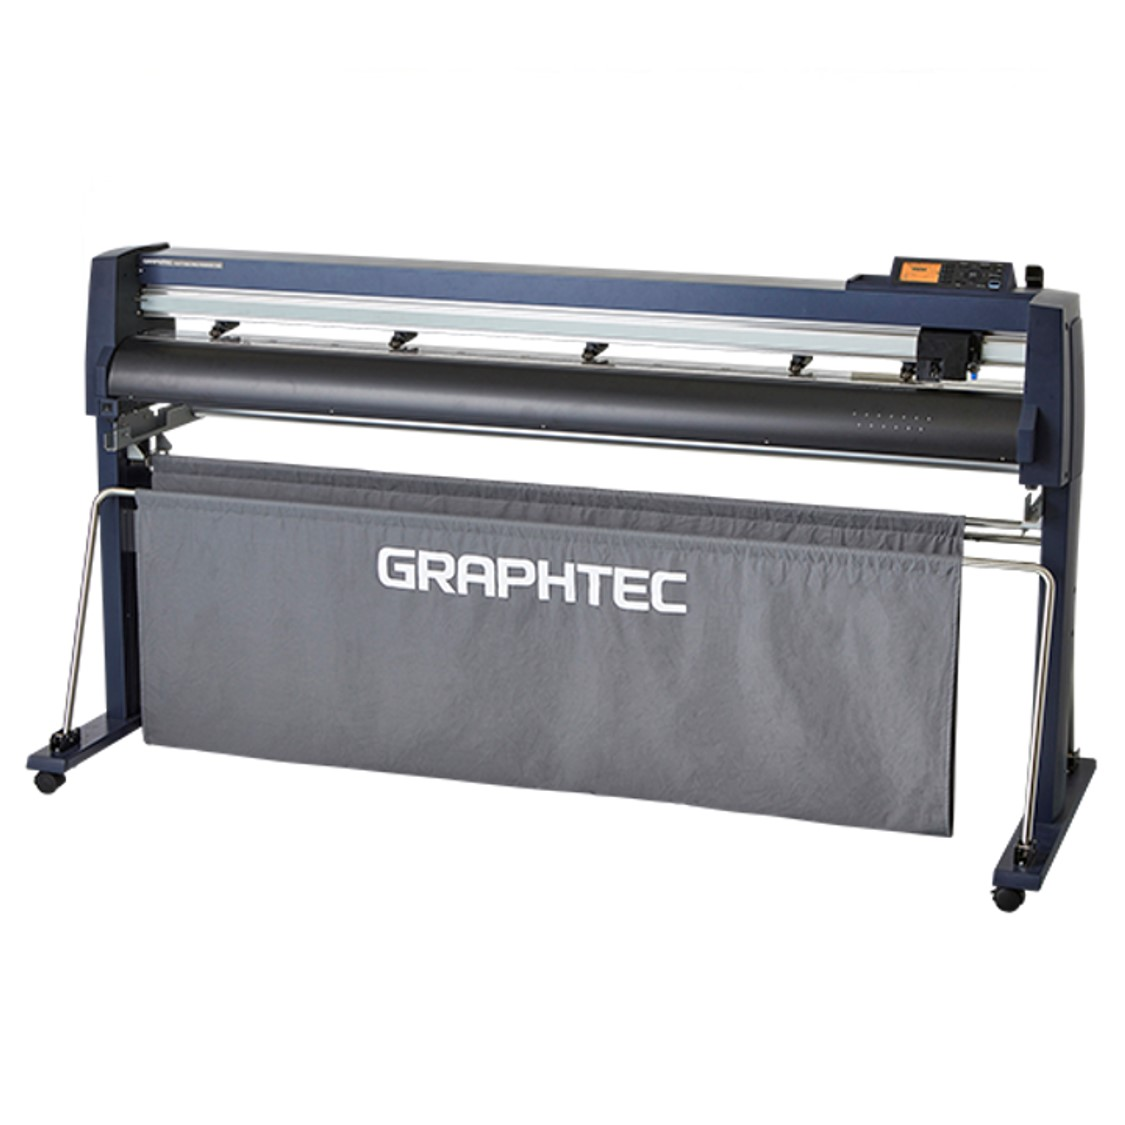 graphtec fc9000 - 160 - angled